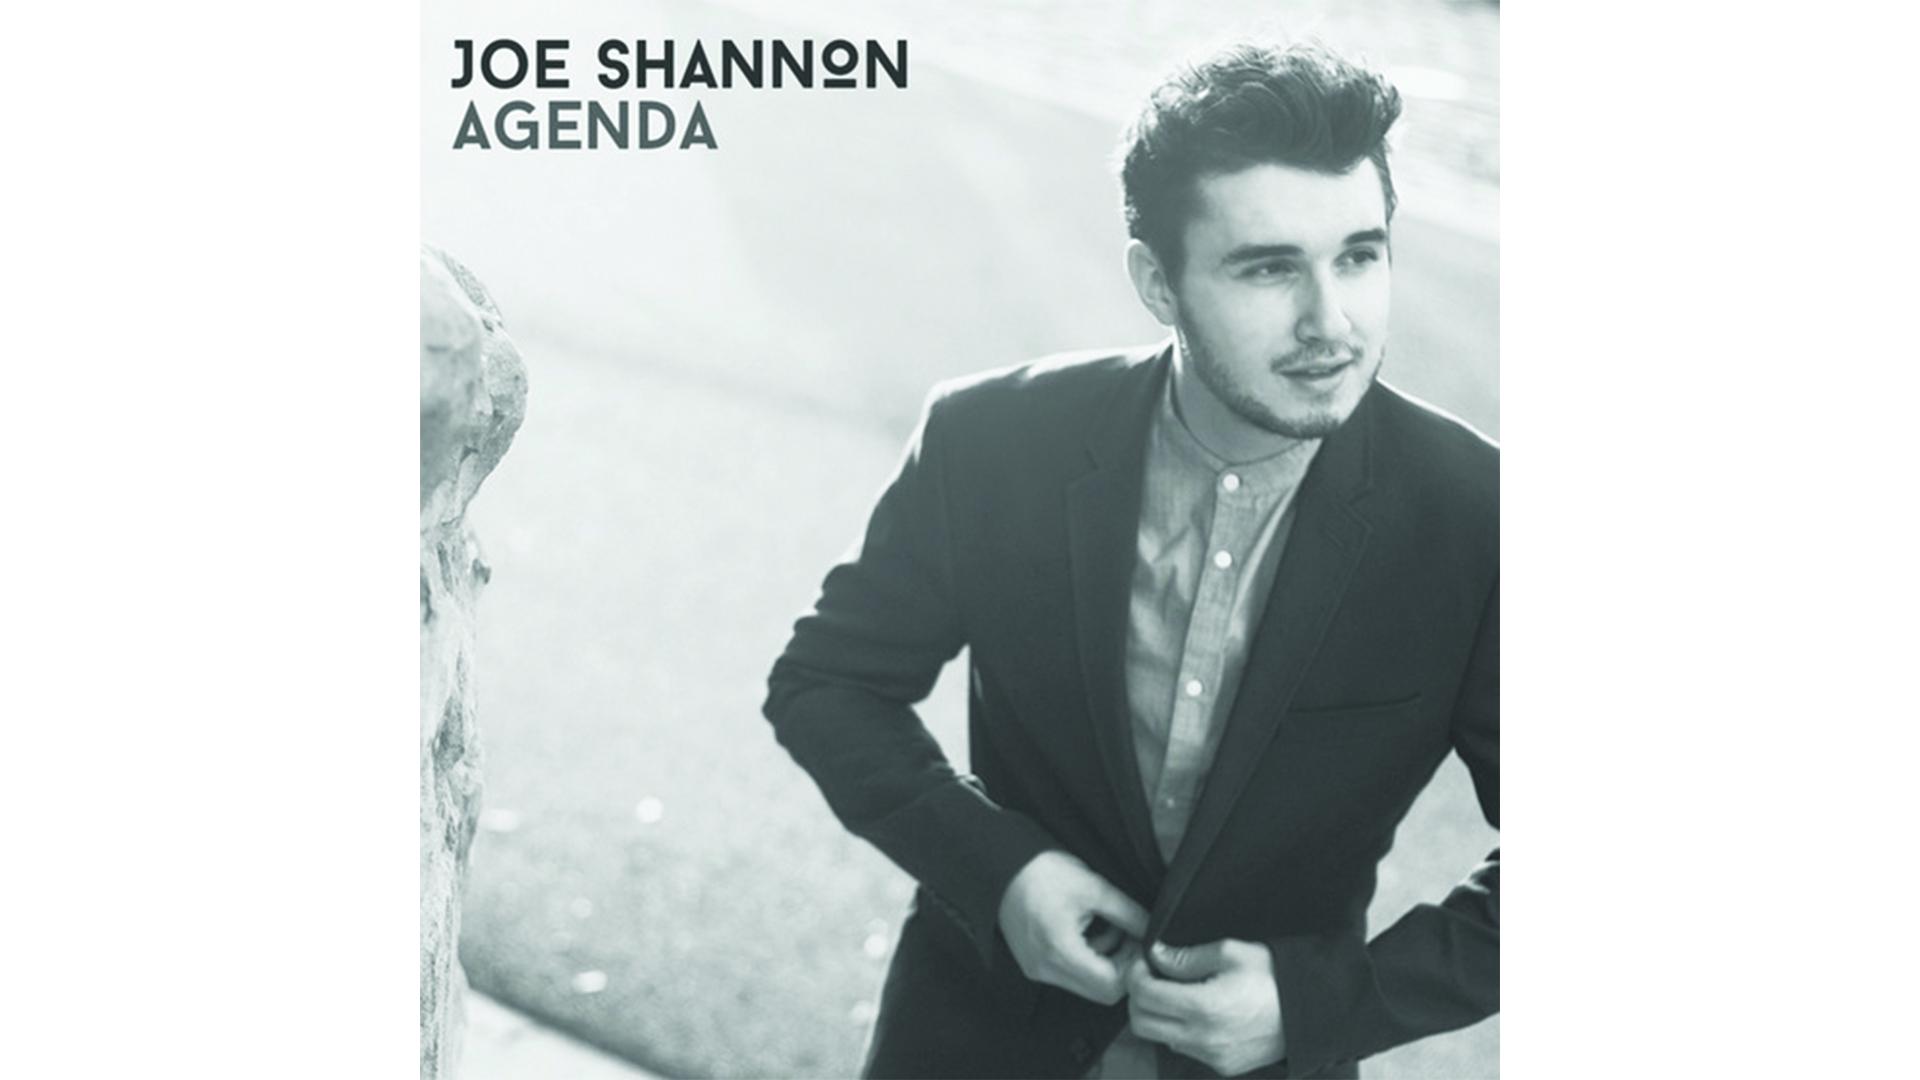 Joe Shannon Music